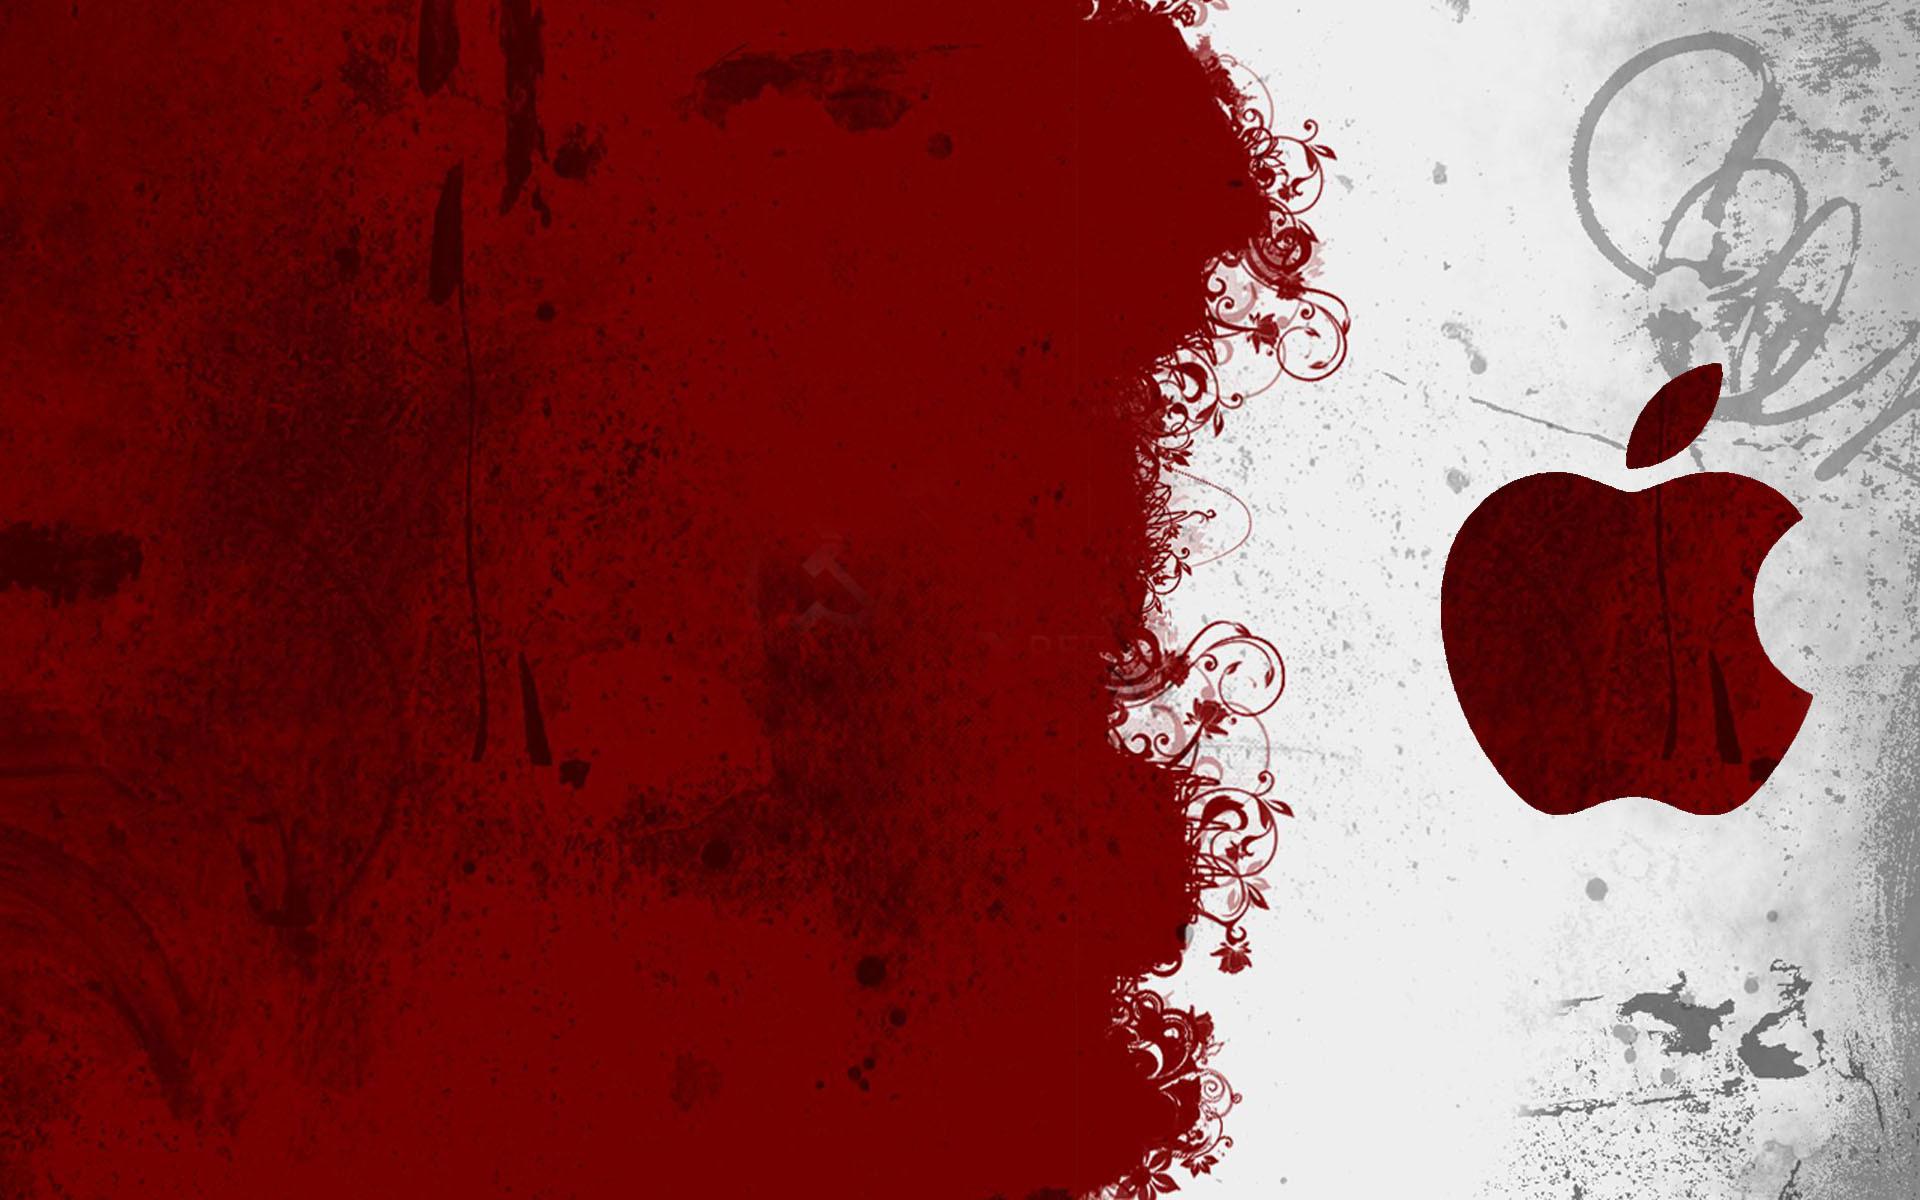 wallpapers, mac, desktop, cool, wallpaper, revolution, red, abstract .